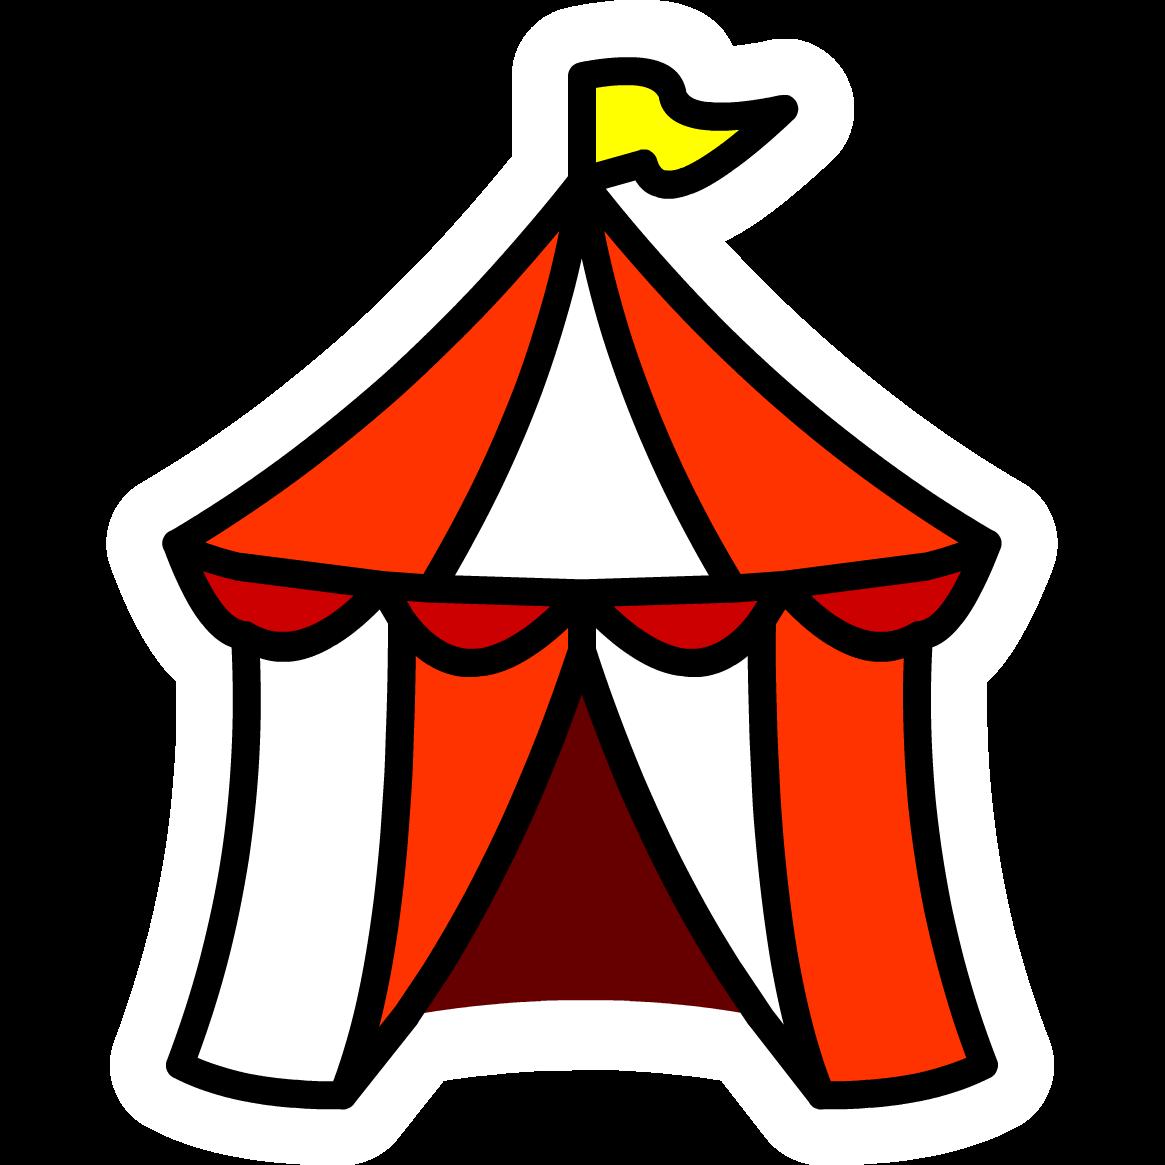 Penguin clipart circus Tent Circus Clipart Clipart Cliparts